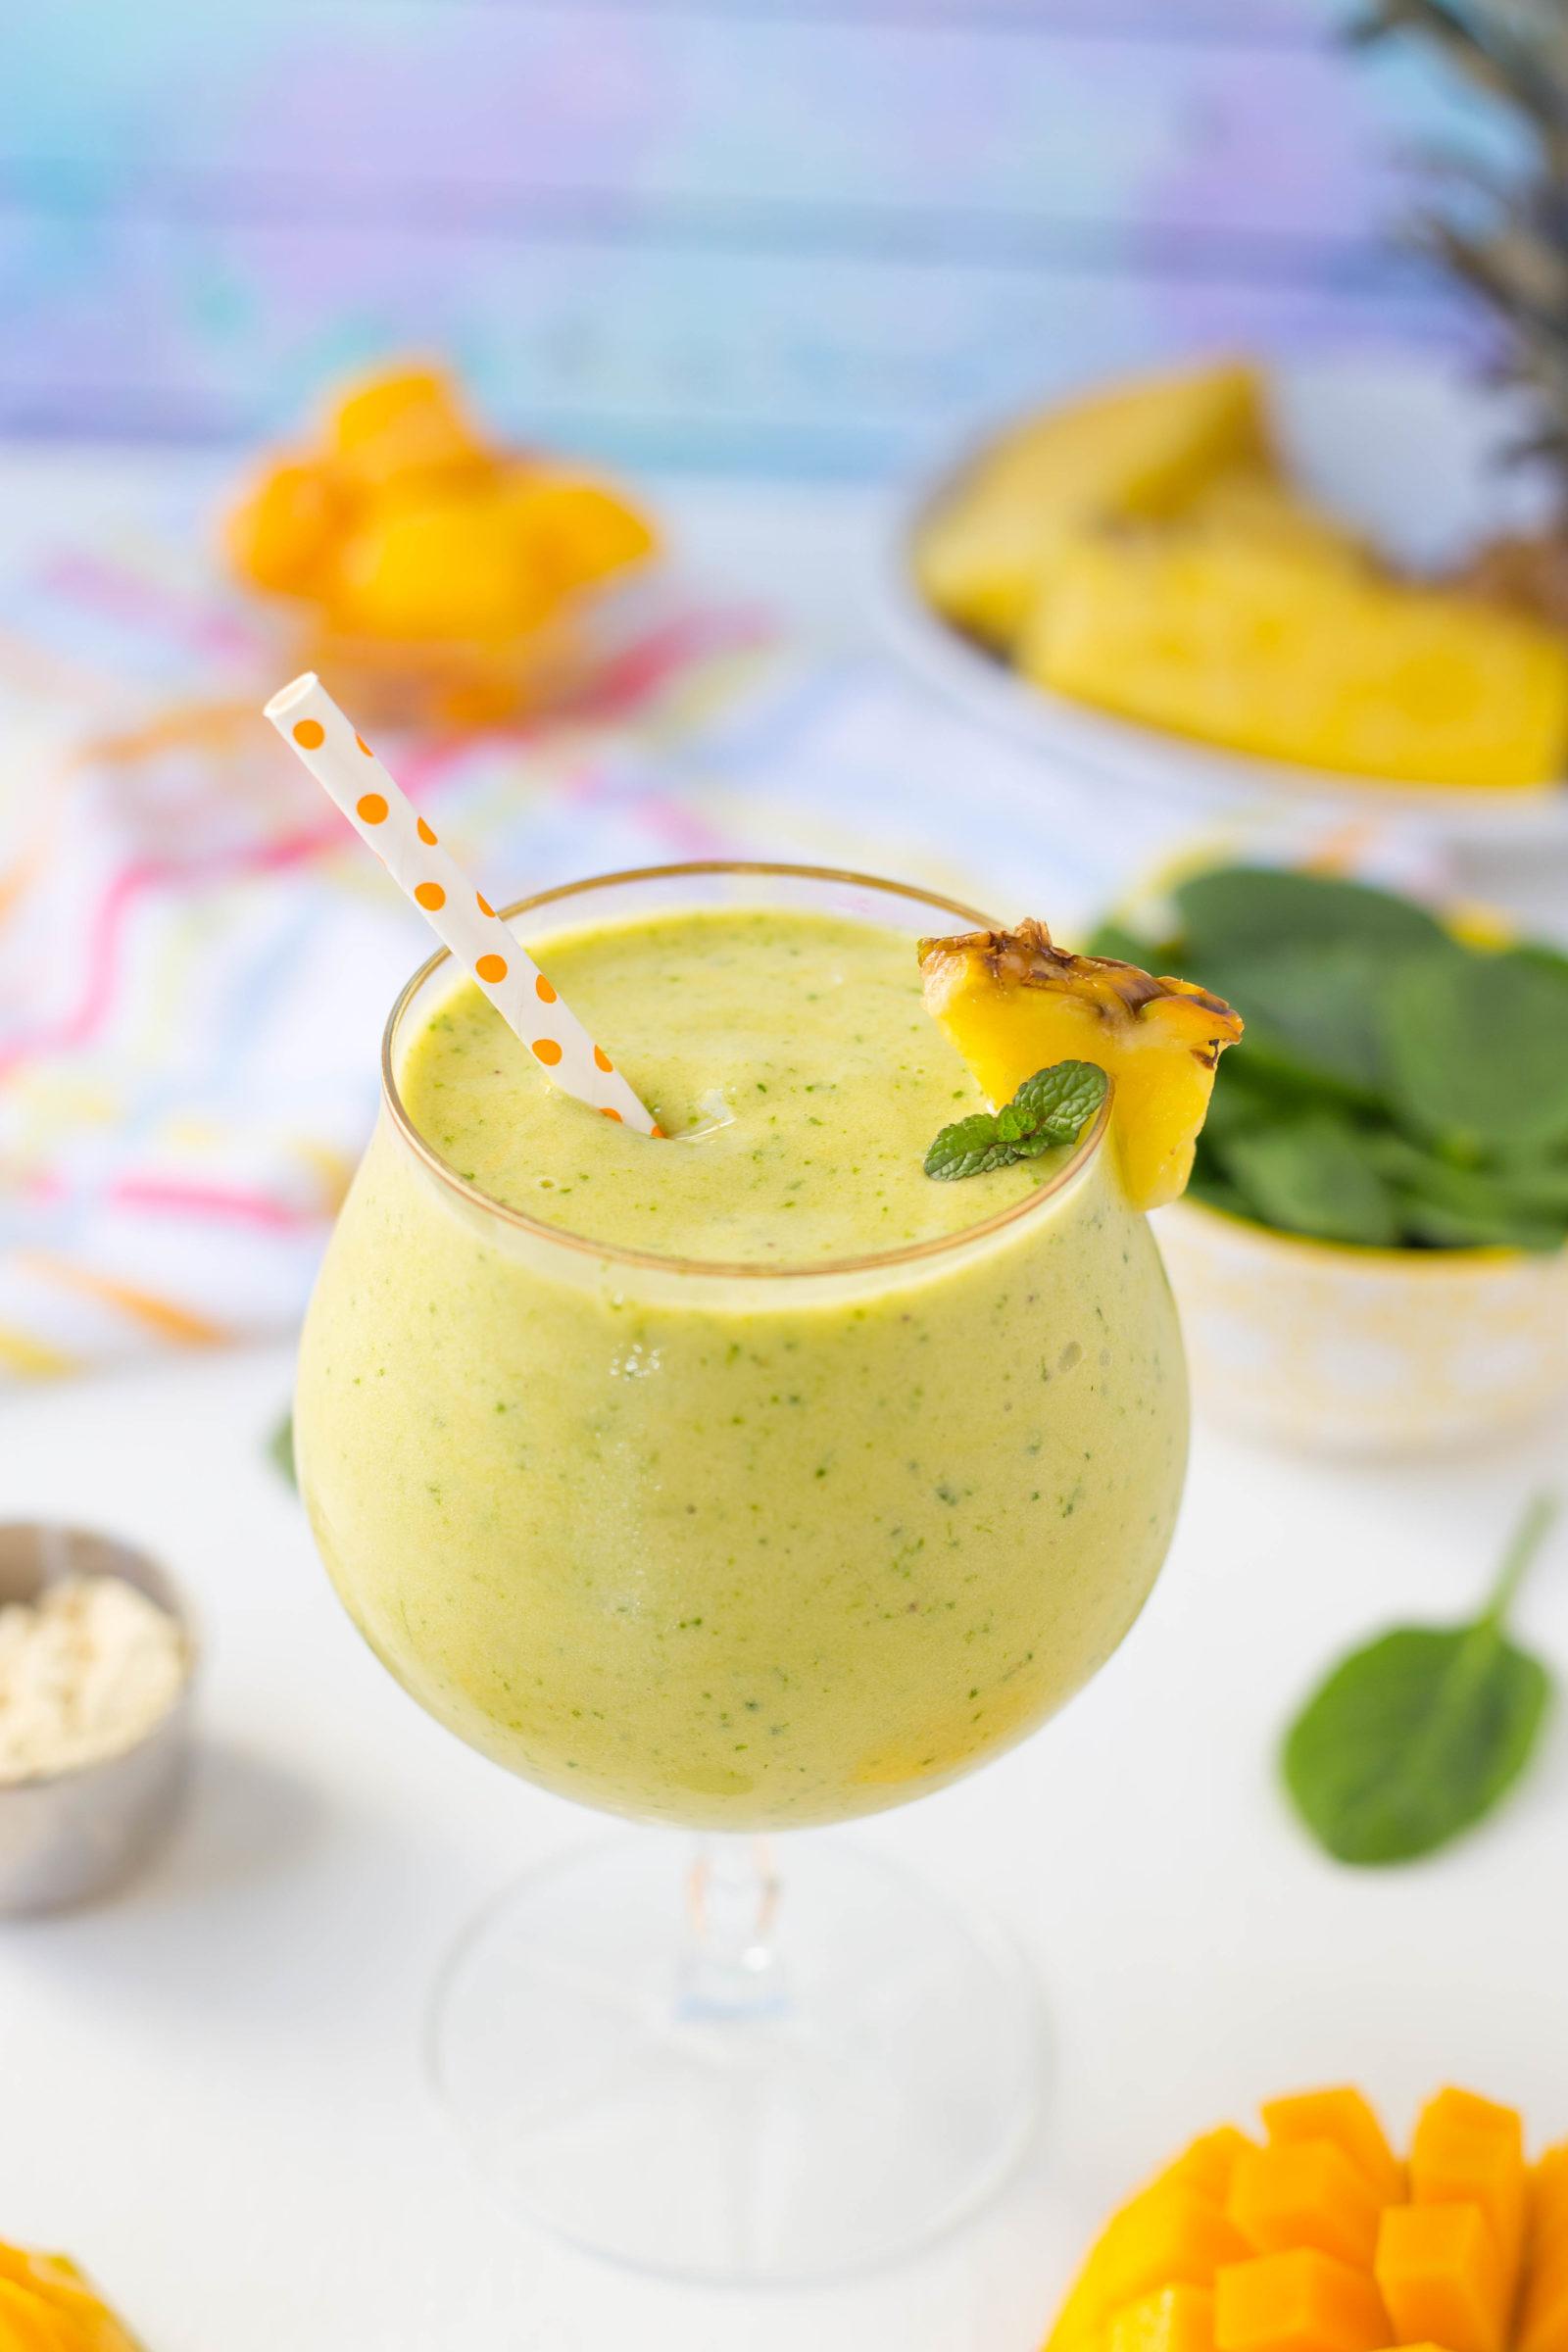 Tropical Green Smoothie | High Protein Smoothie | Pineapple Mango Smoothie